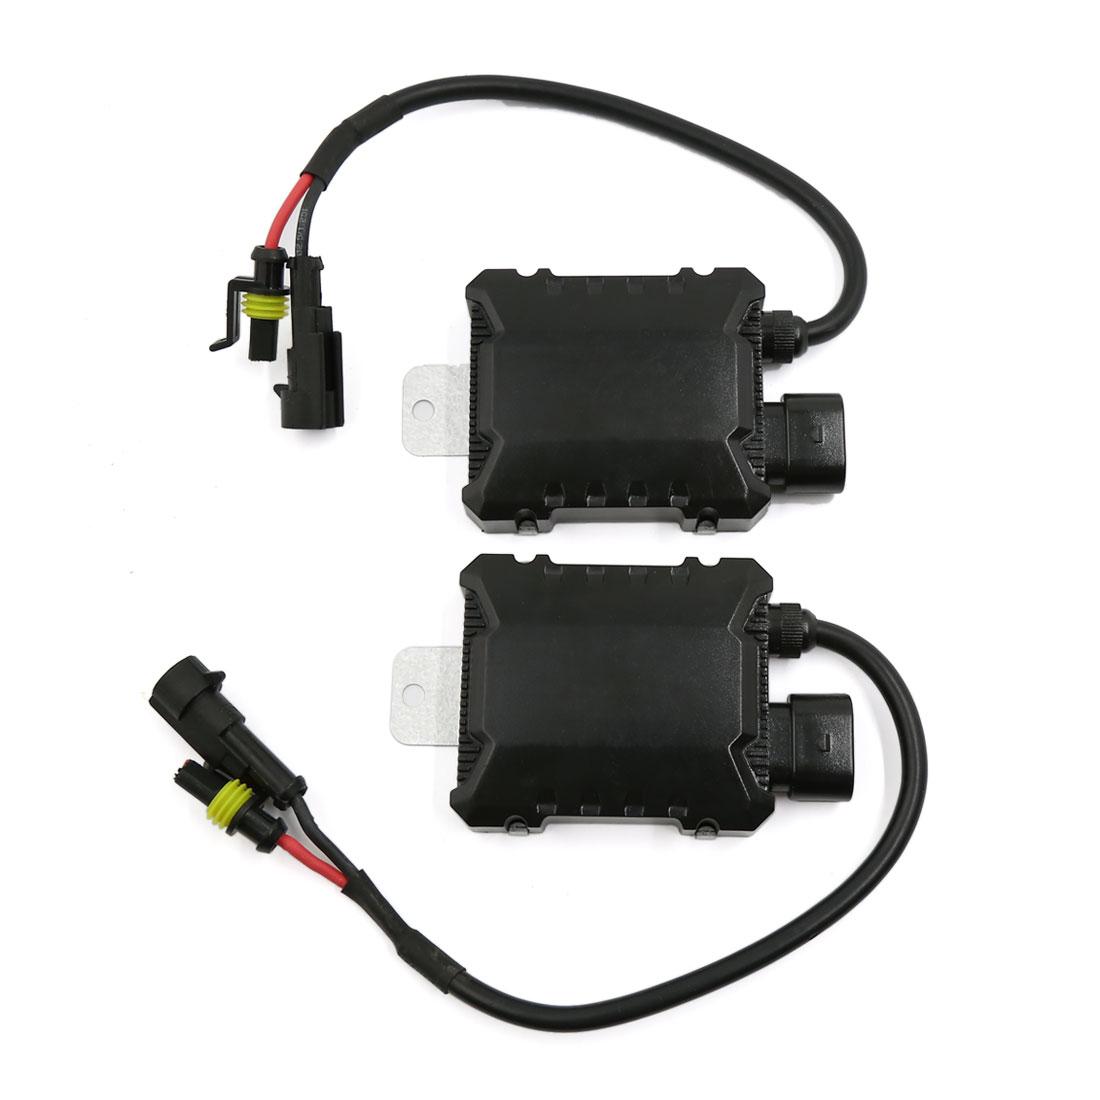 2pcs Mini Ultra Slim HID Xenon Ballast 35W for H1 H3 H7 H8 H9 H10 H11 Light Bulb